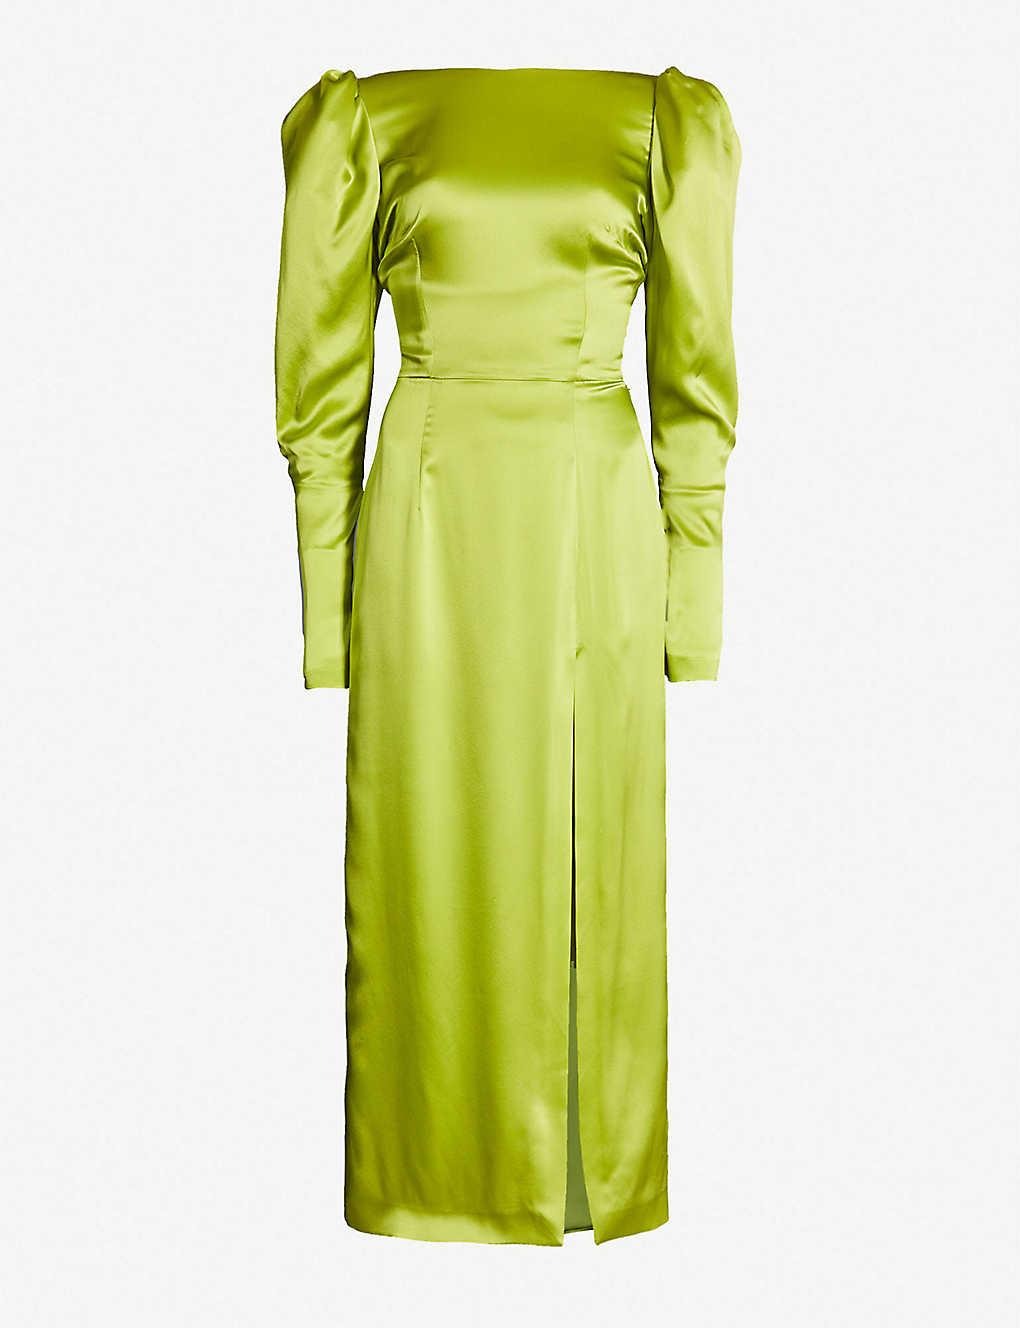 20a9f83a1a5ac 16 ARLINGTON - Puffed-shoulder silk dress